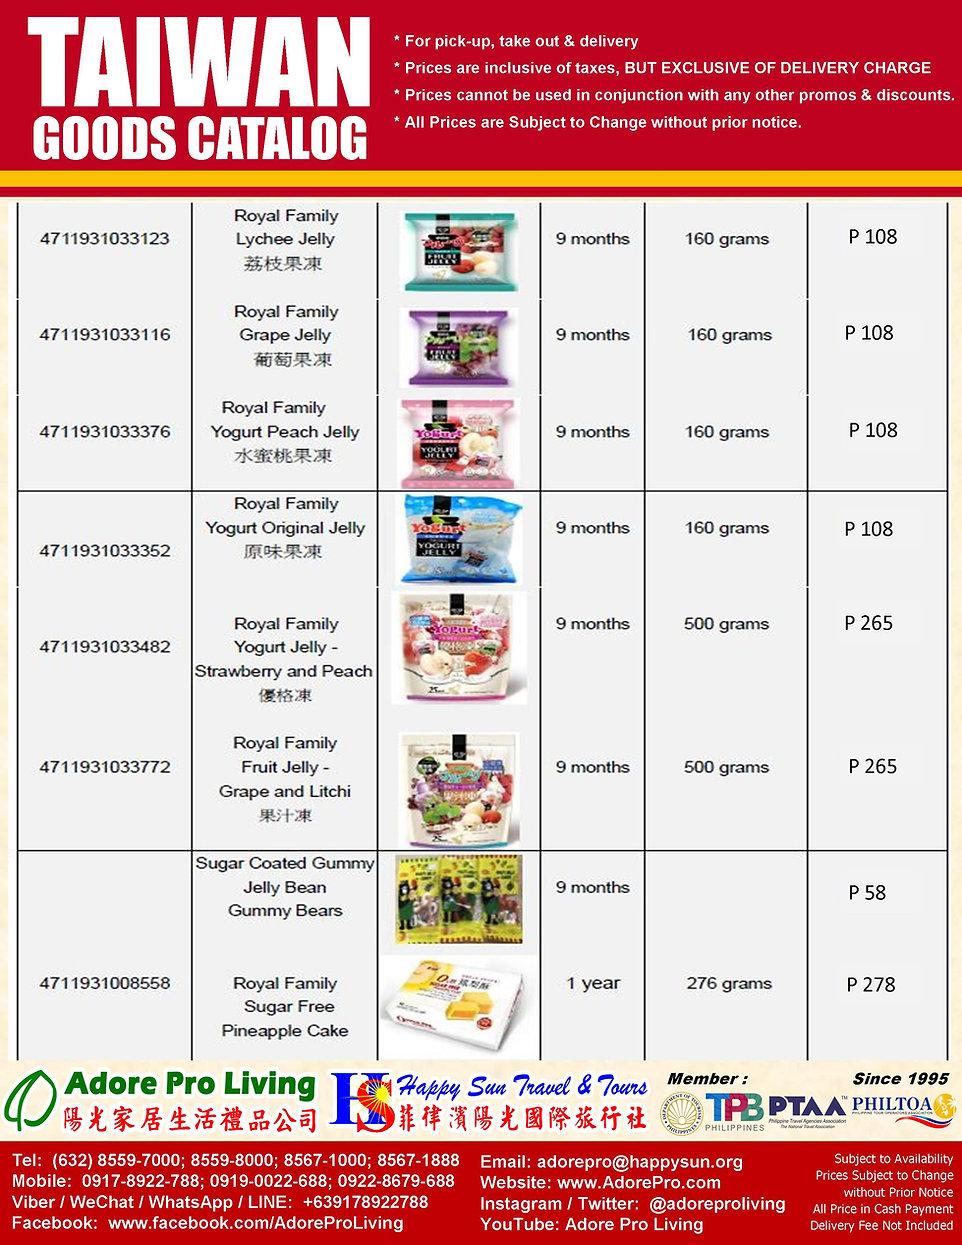 P6_Taiwan Goods Catalog_202009119.jpg